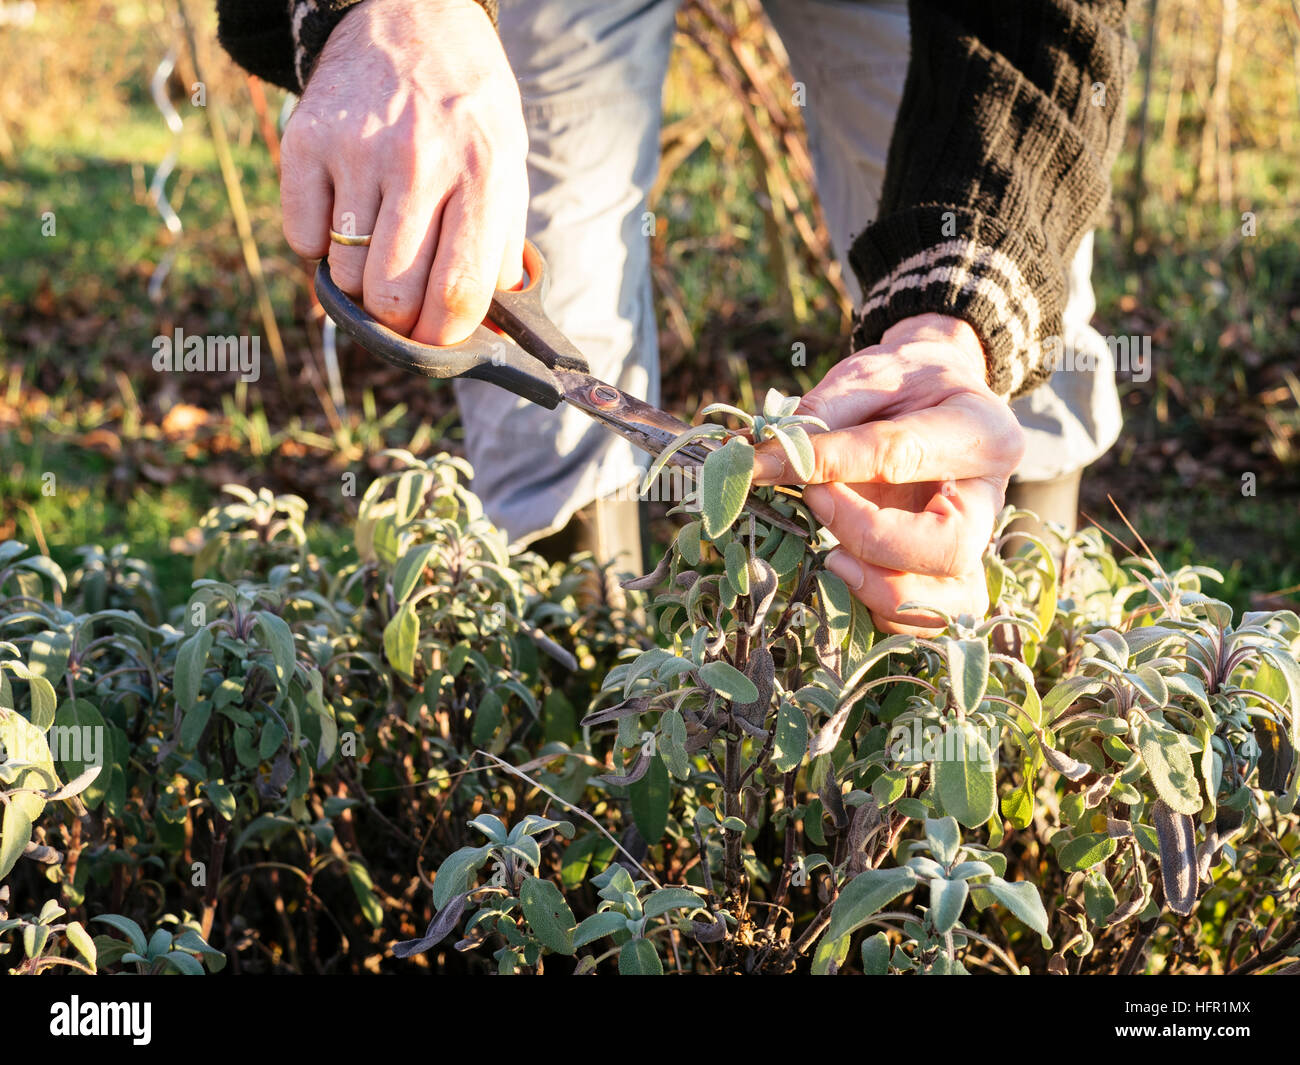 Gardener harvesting sage (Salvia officinalis)  leaves in a herb garden to make fresh sage tea.. Stock Photo